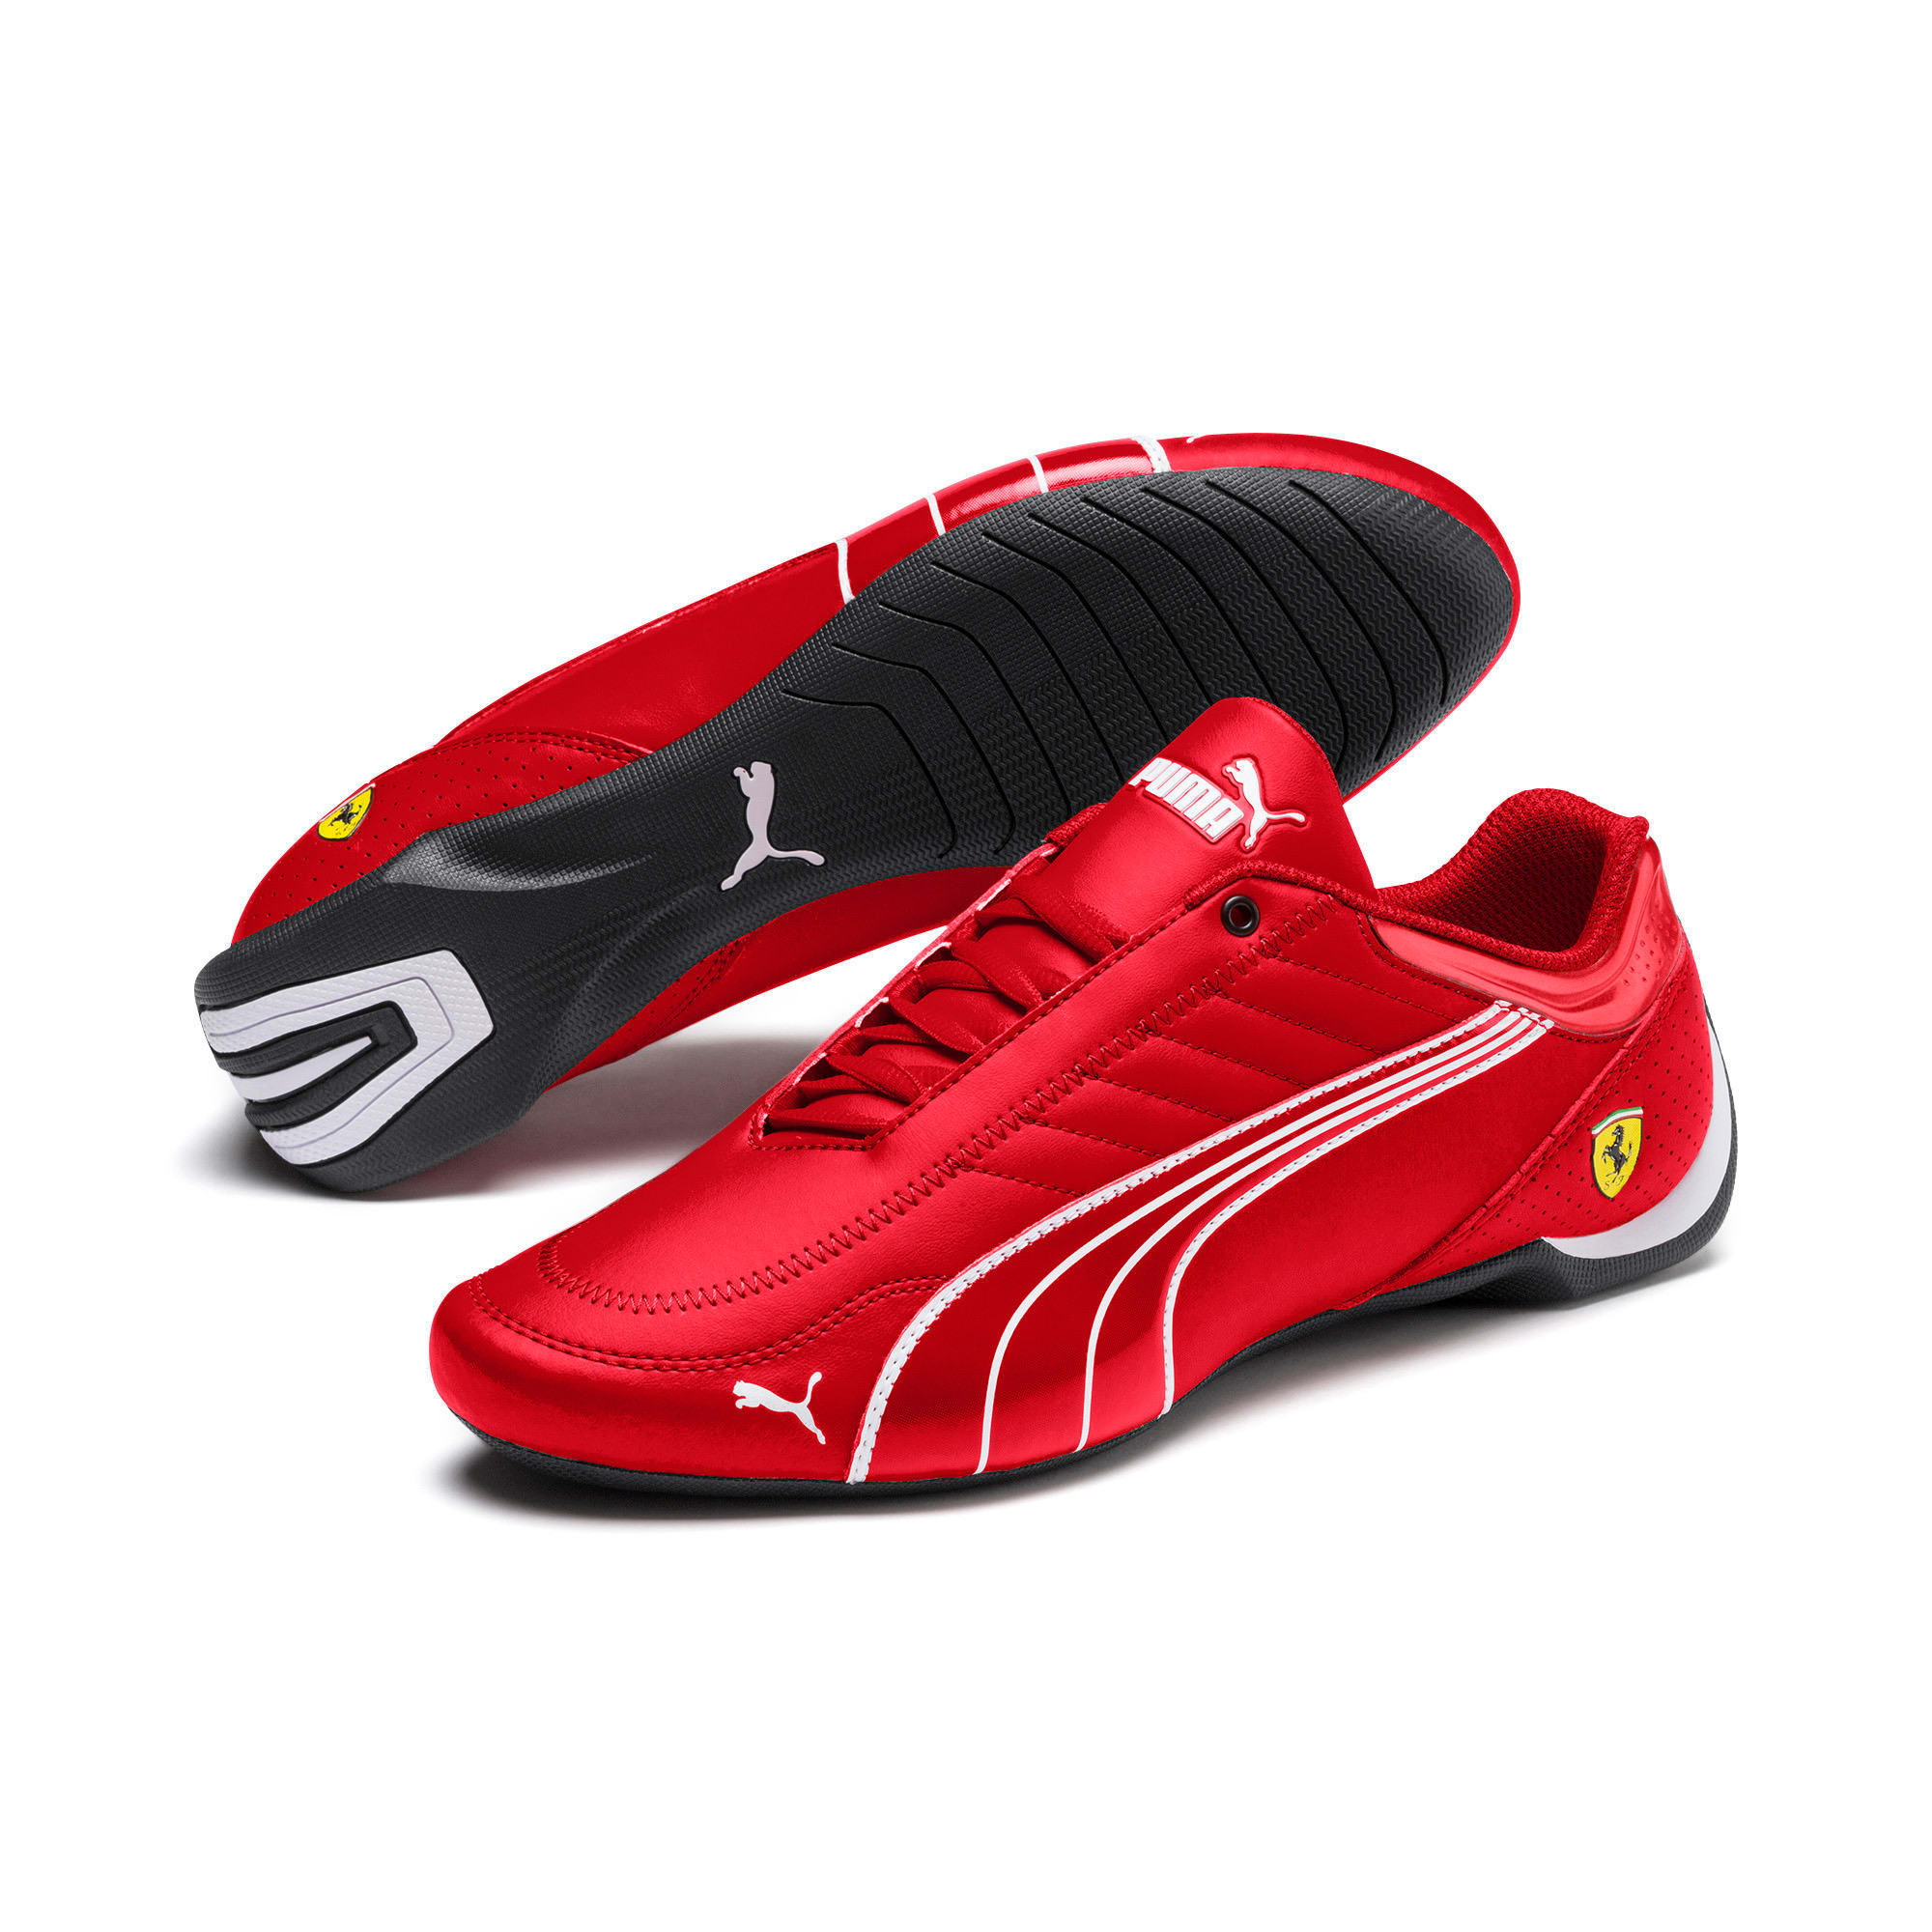 Thumbnail 4 of Ferrari Future Kart Cat Trainers, Rosso Corsa-Puma Black, medium-IND